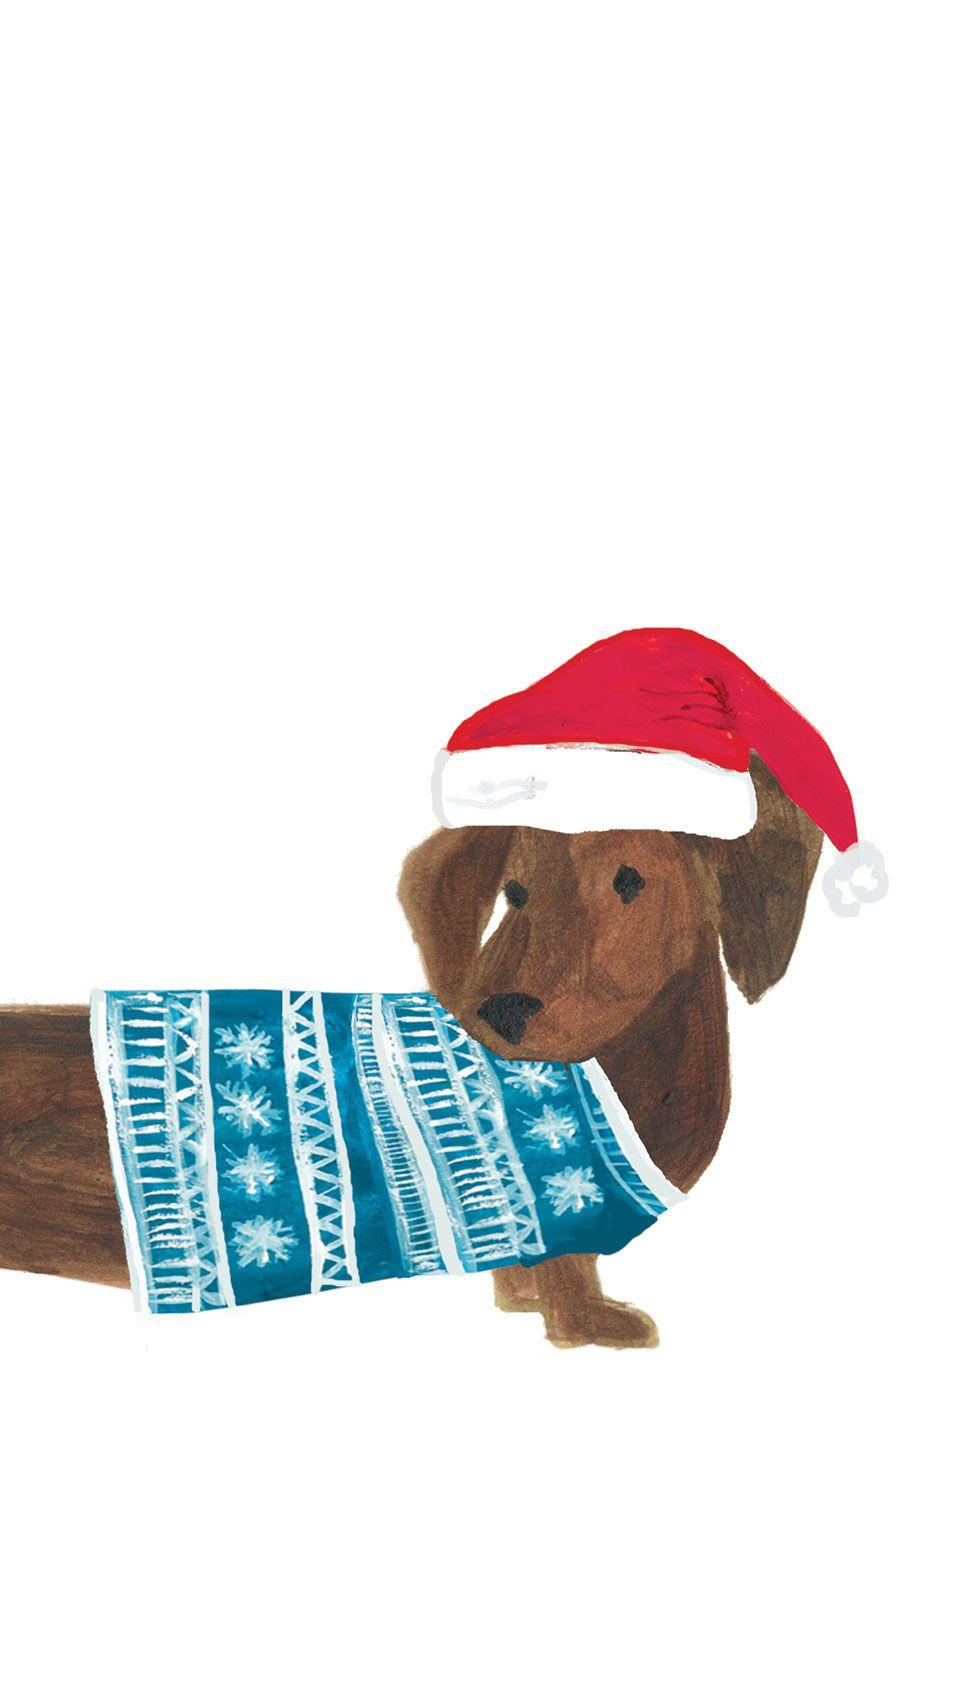 Free Festive Digital Mobile Wallpaper By Caroline Gardner A Cute Sausage Dog Illustration Wallpaper Free Download Christmas Card Illustration Mobile Wallpaper